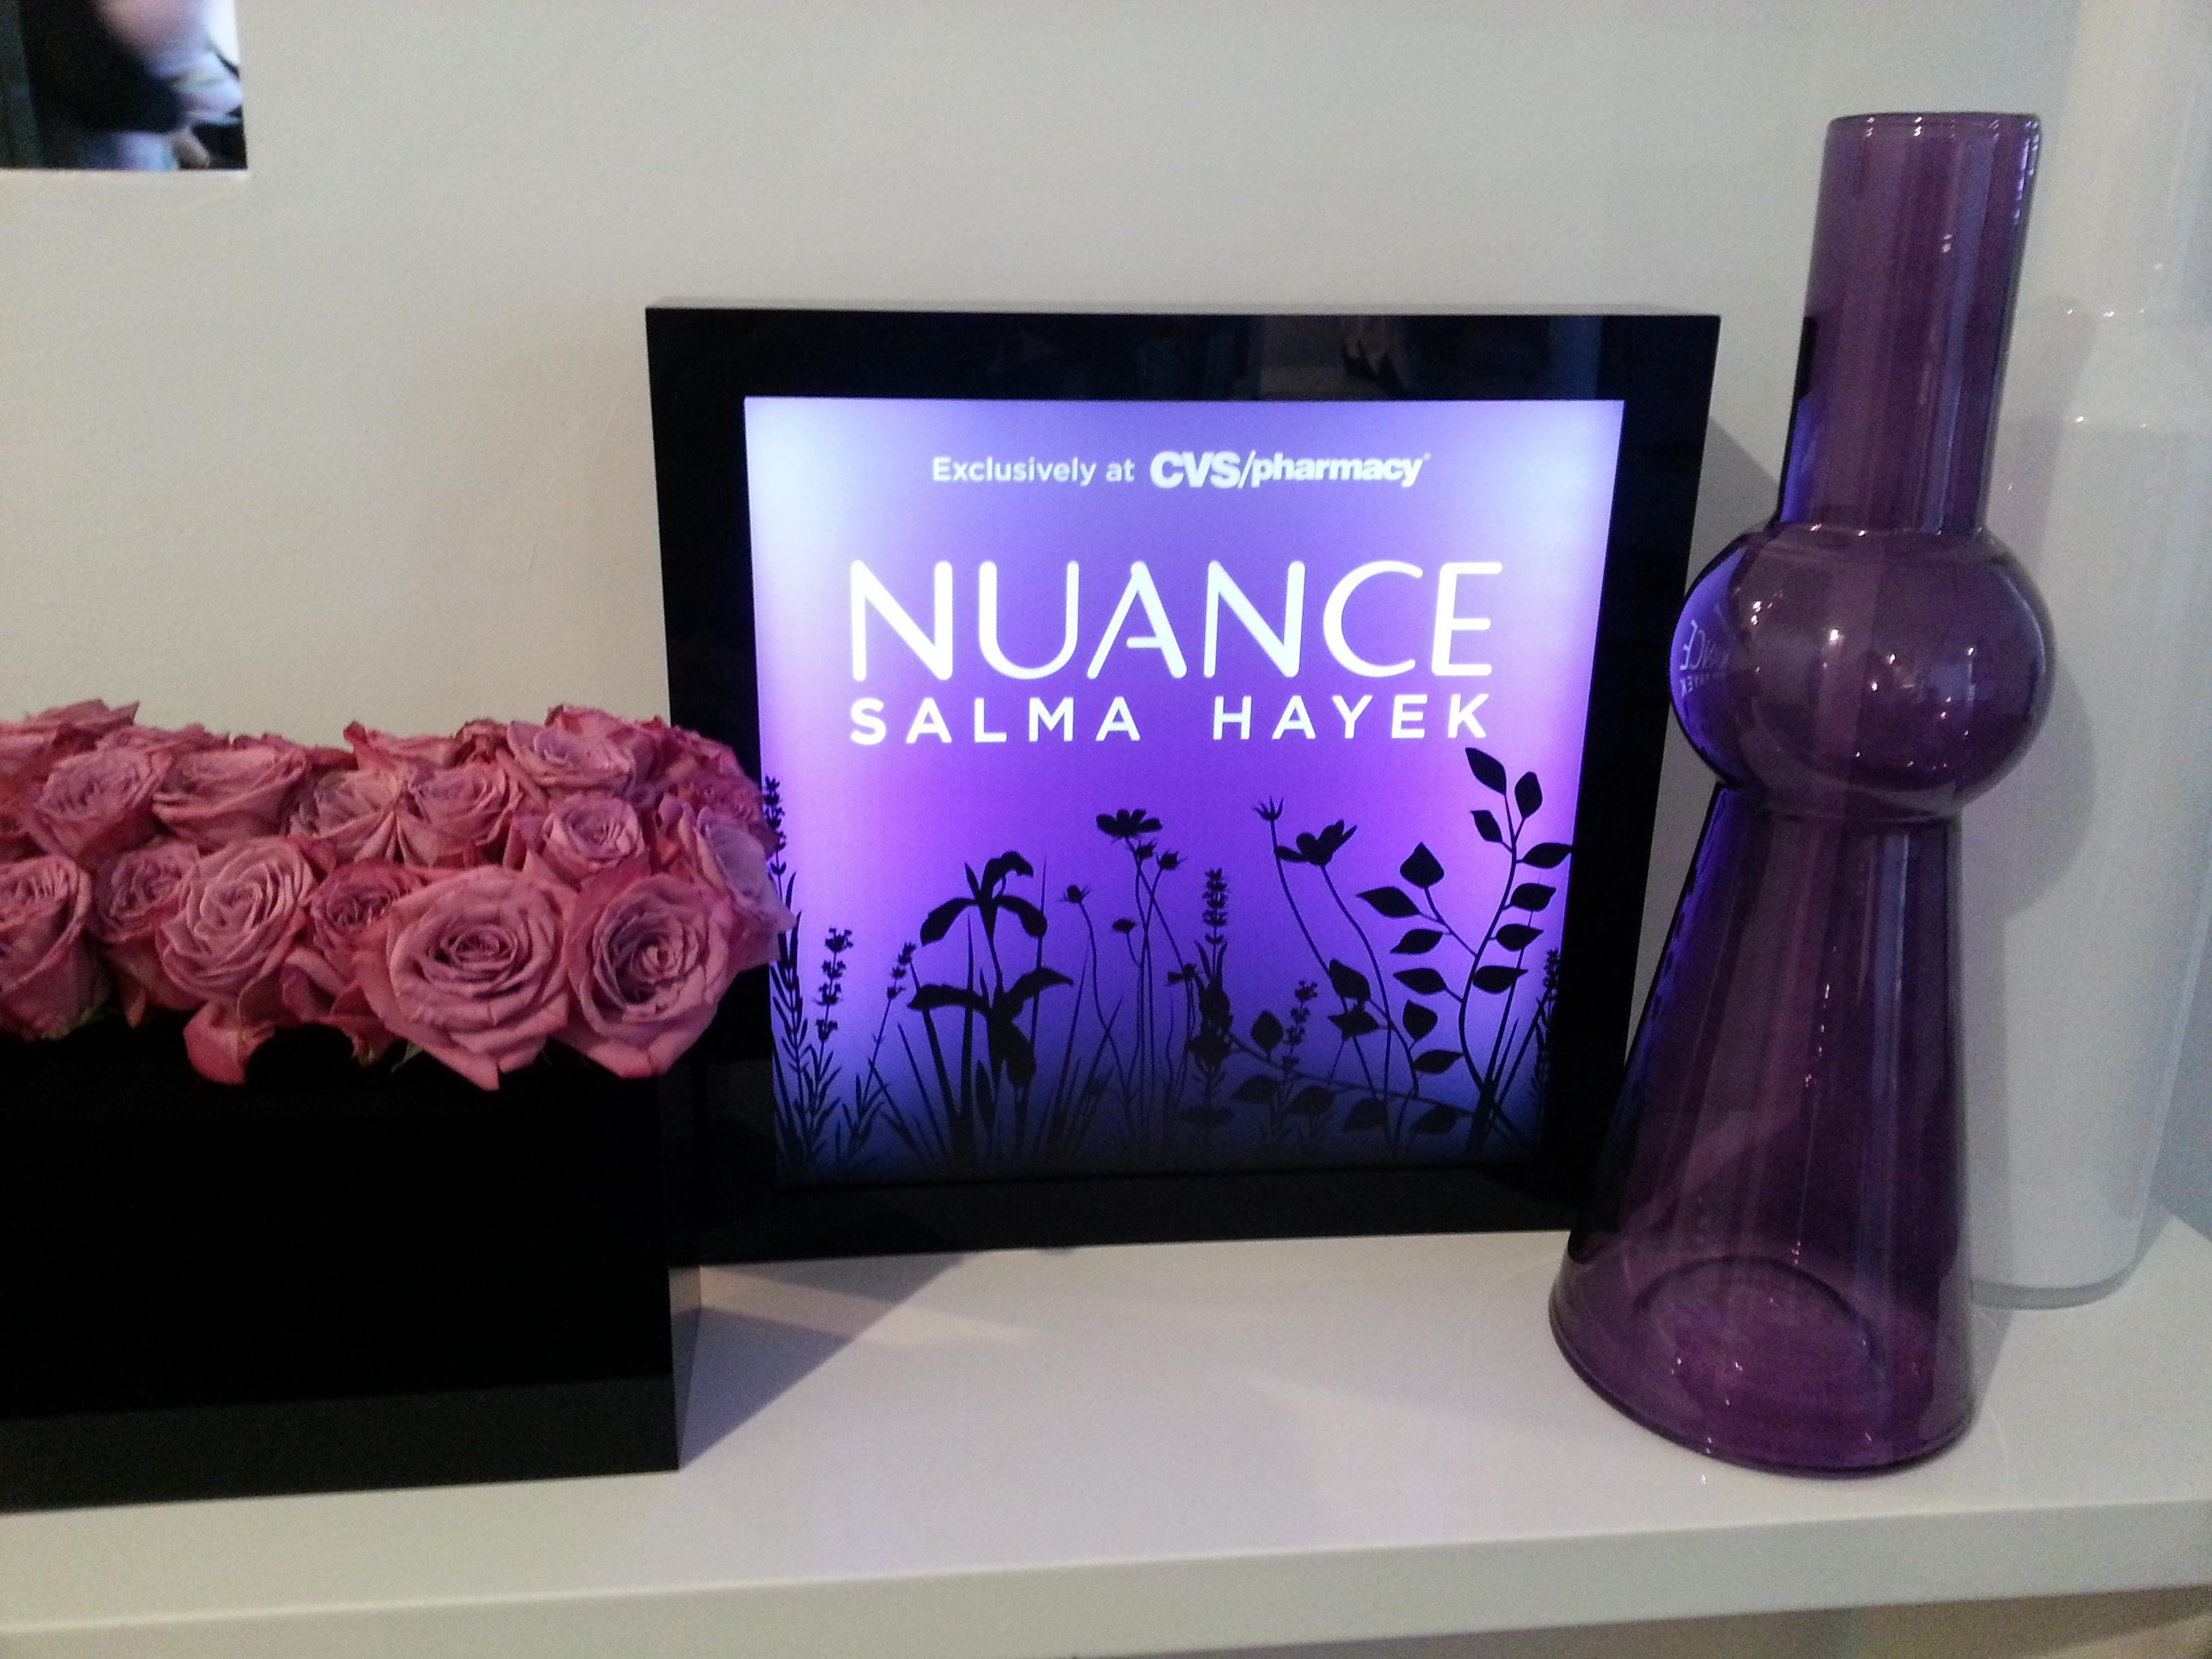 Nuance Salma Hayek Spring 2014 Collection